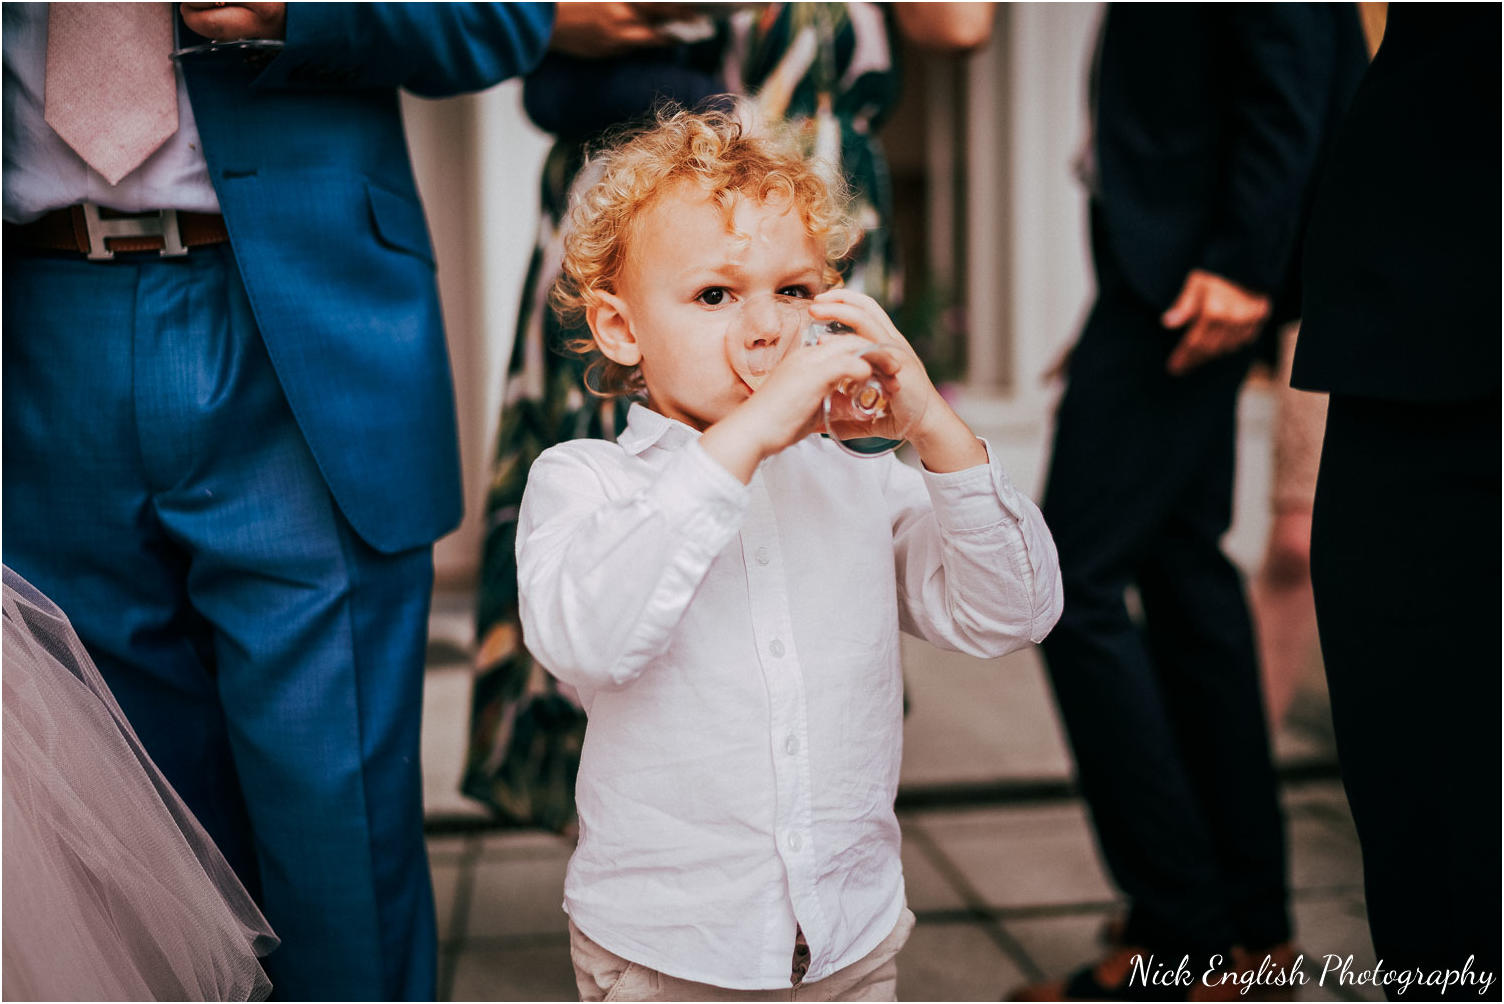 Destination_Wedding_Photographer_Slovenia_Nick_English_Photography-65.jpg